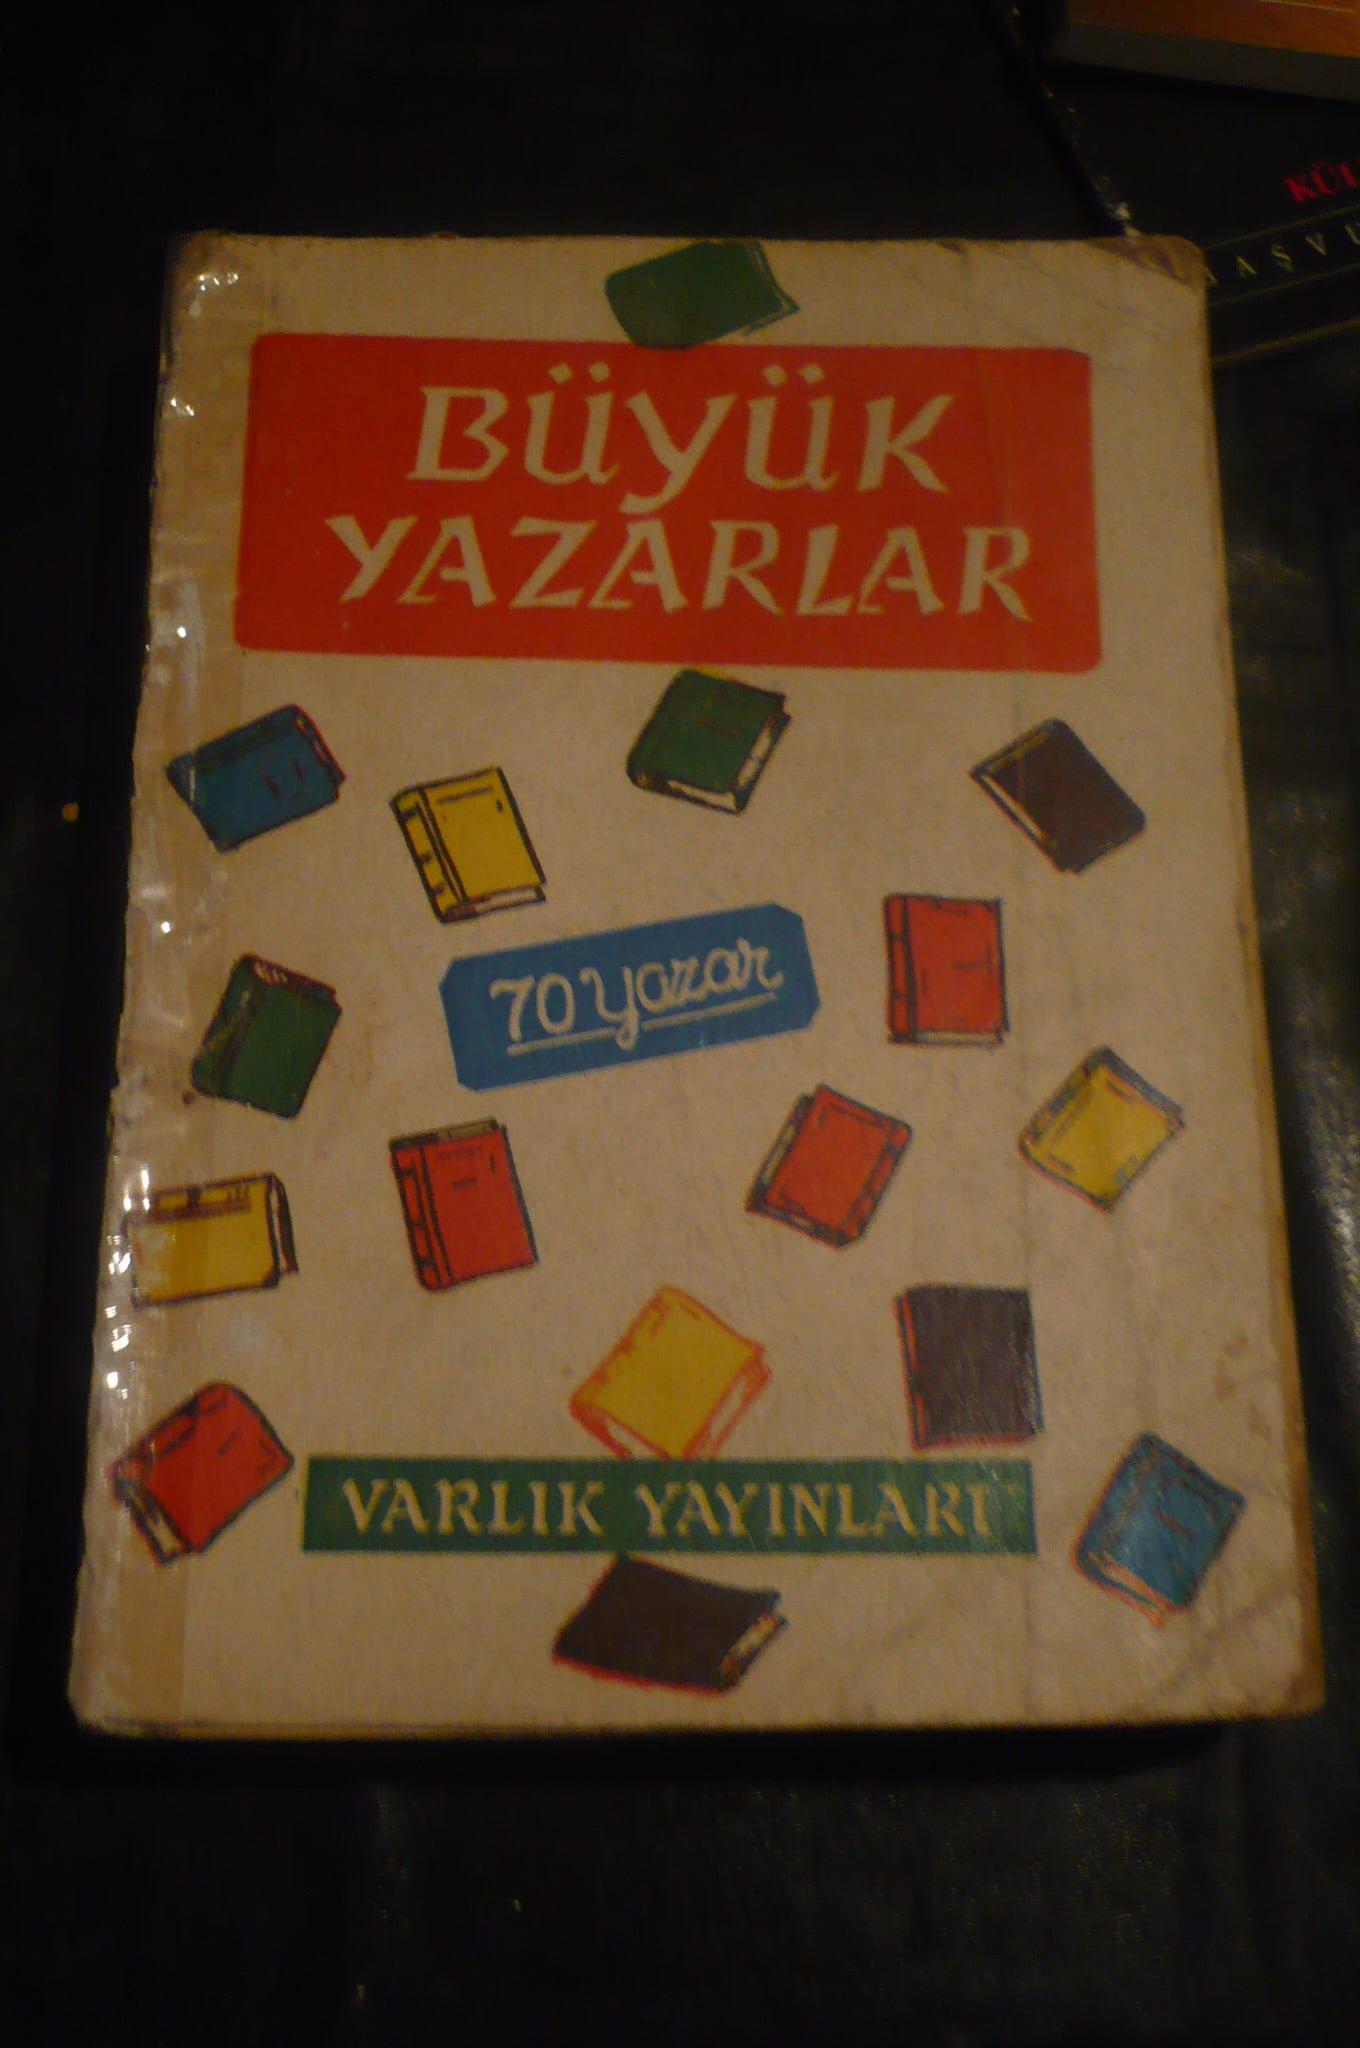 BÜYÜK YAZARLAR-70 YAZAR/ VARLIK YAY/ 15 TL